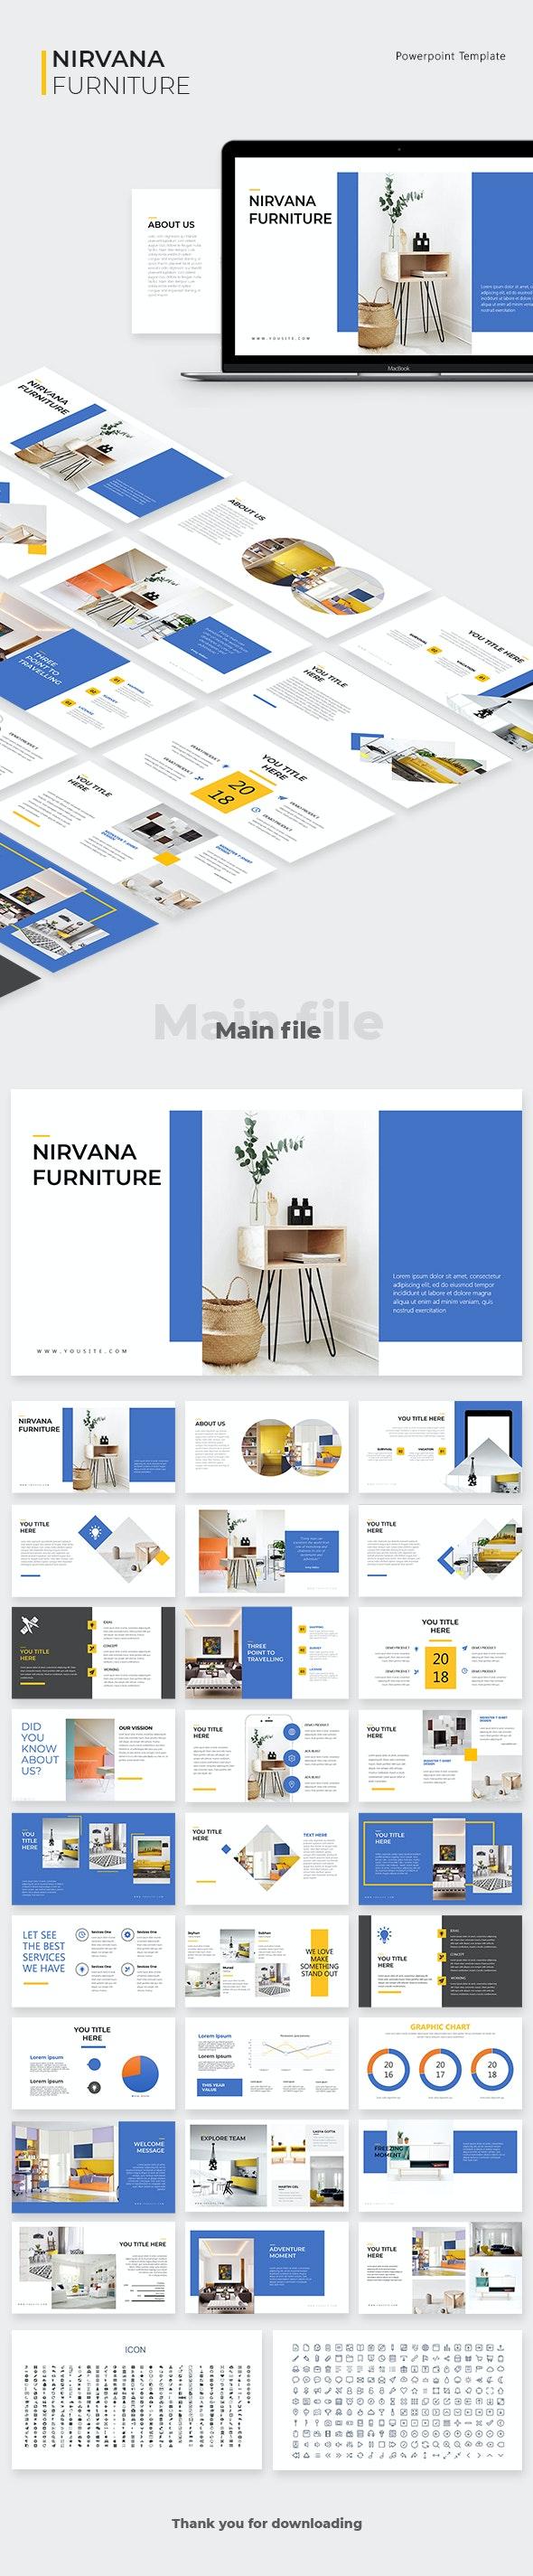 Nirvana Powerpoint Template - Business PowerPoint Templates